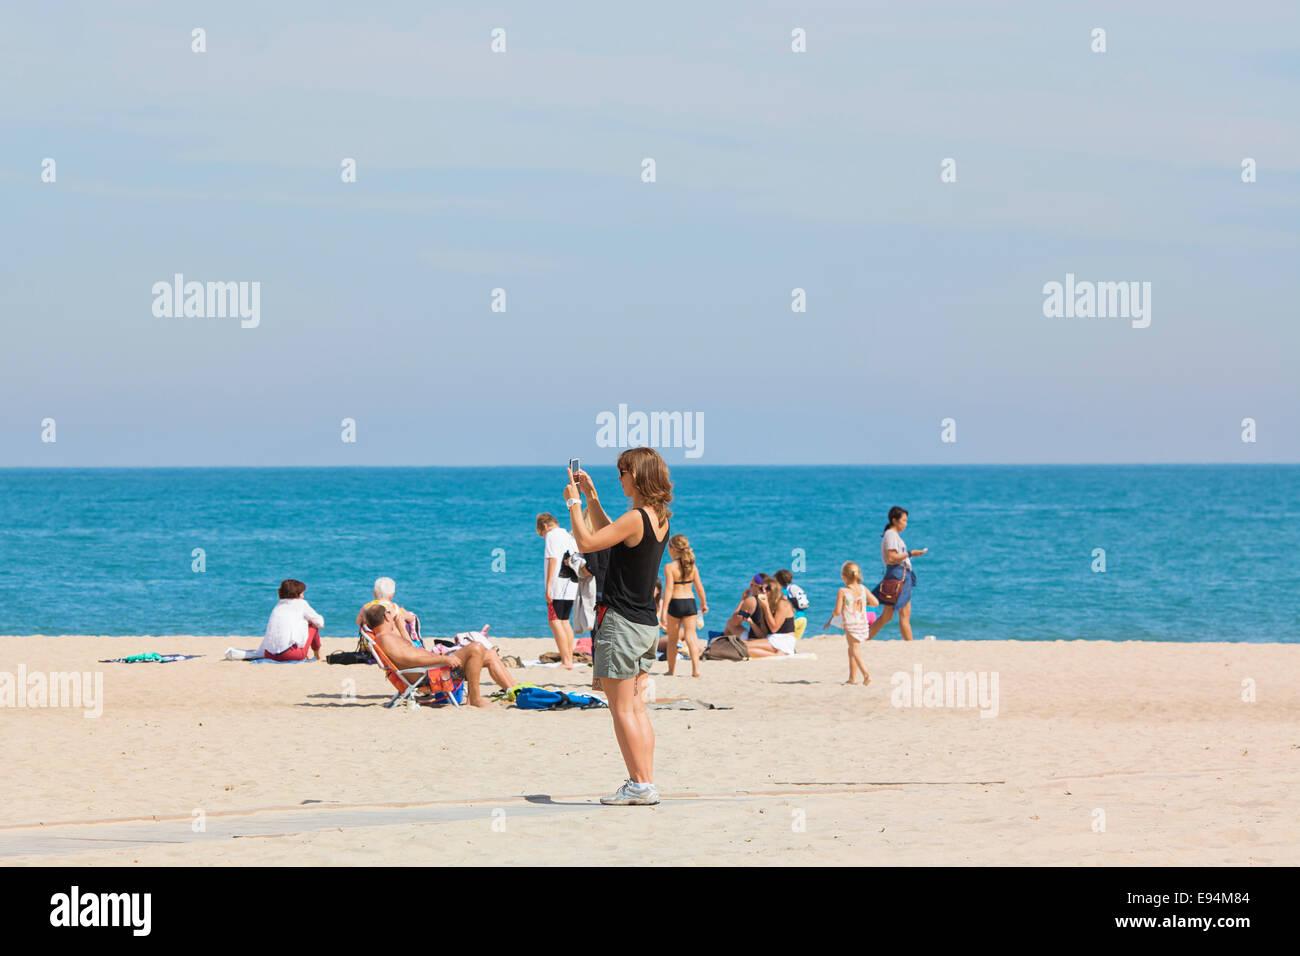 Woman on Beach with Mobile Phone, prendre des photos Banque D'Images